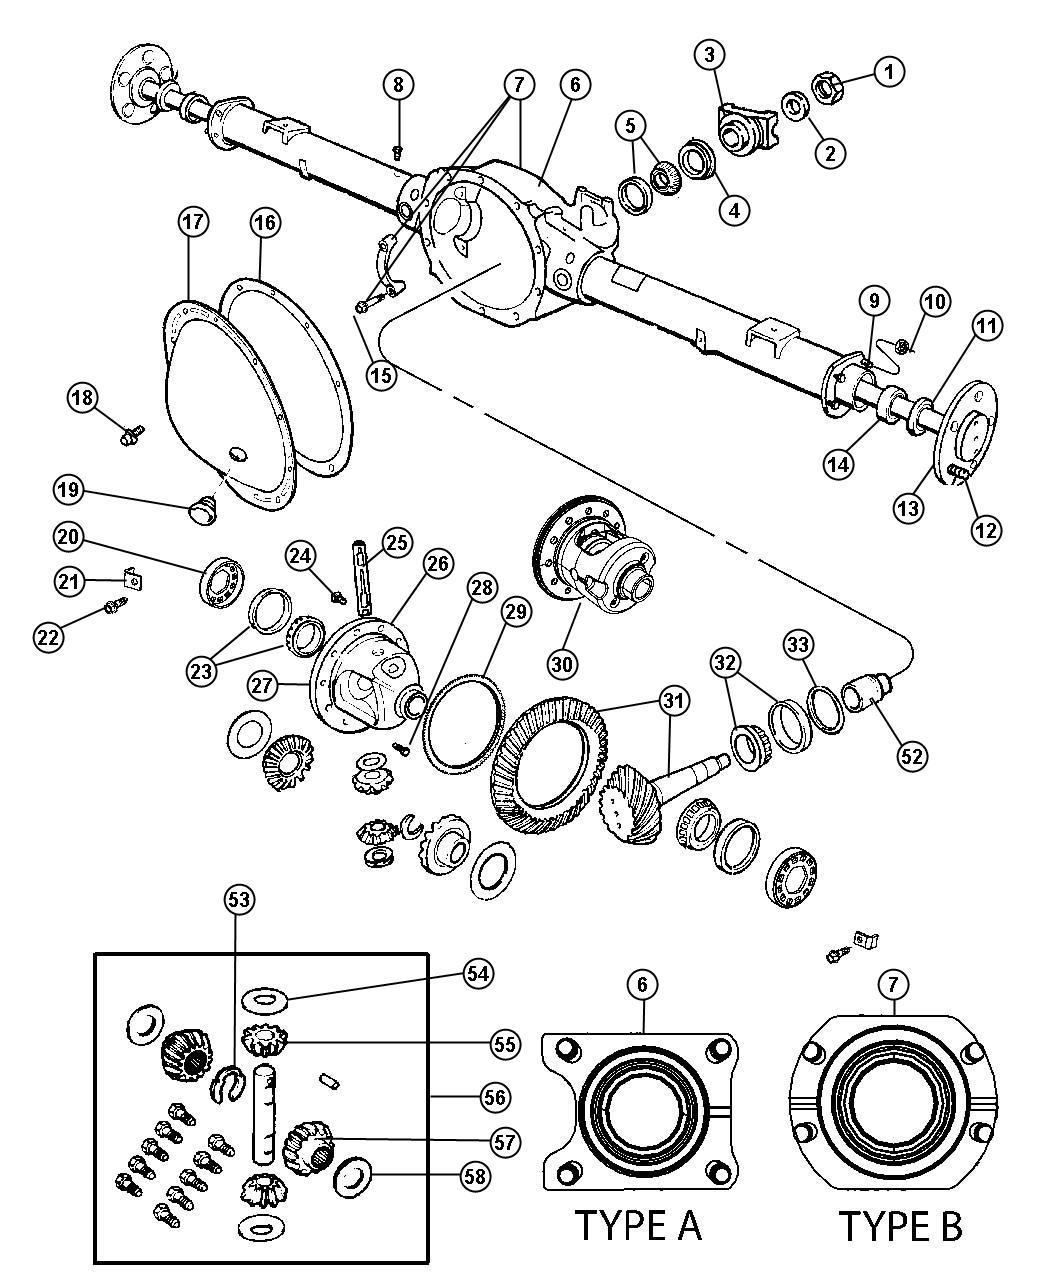 tags: #demag parts manual#magnetek motor parts diagram#viper alarm wiring# demag cranes manuals#cm hoist wiring diagram#xbox one controller wiring